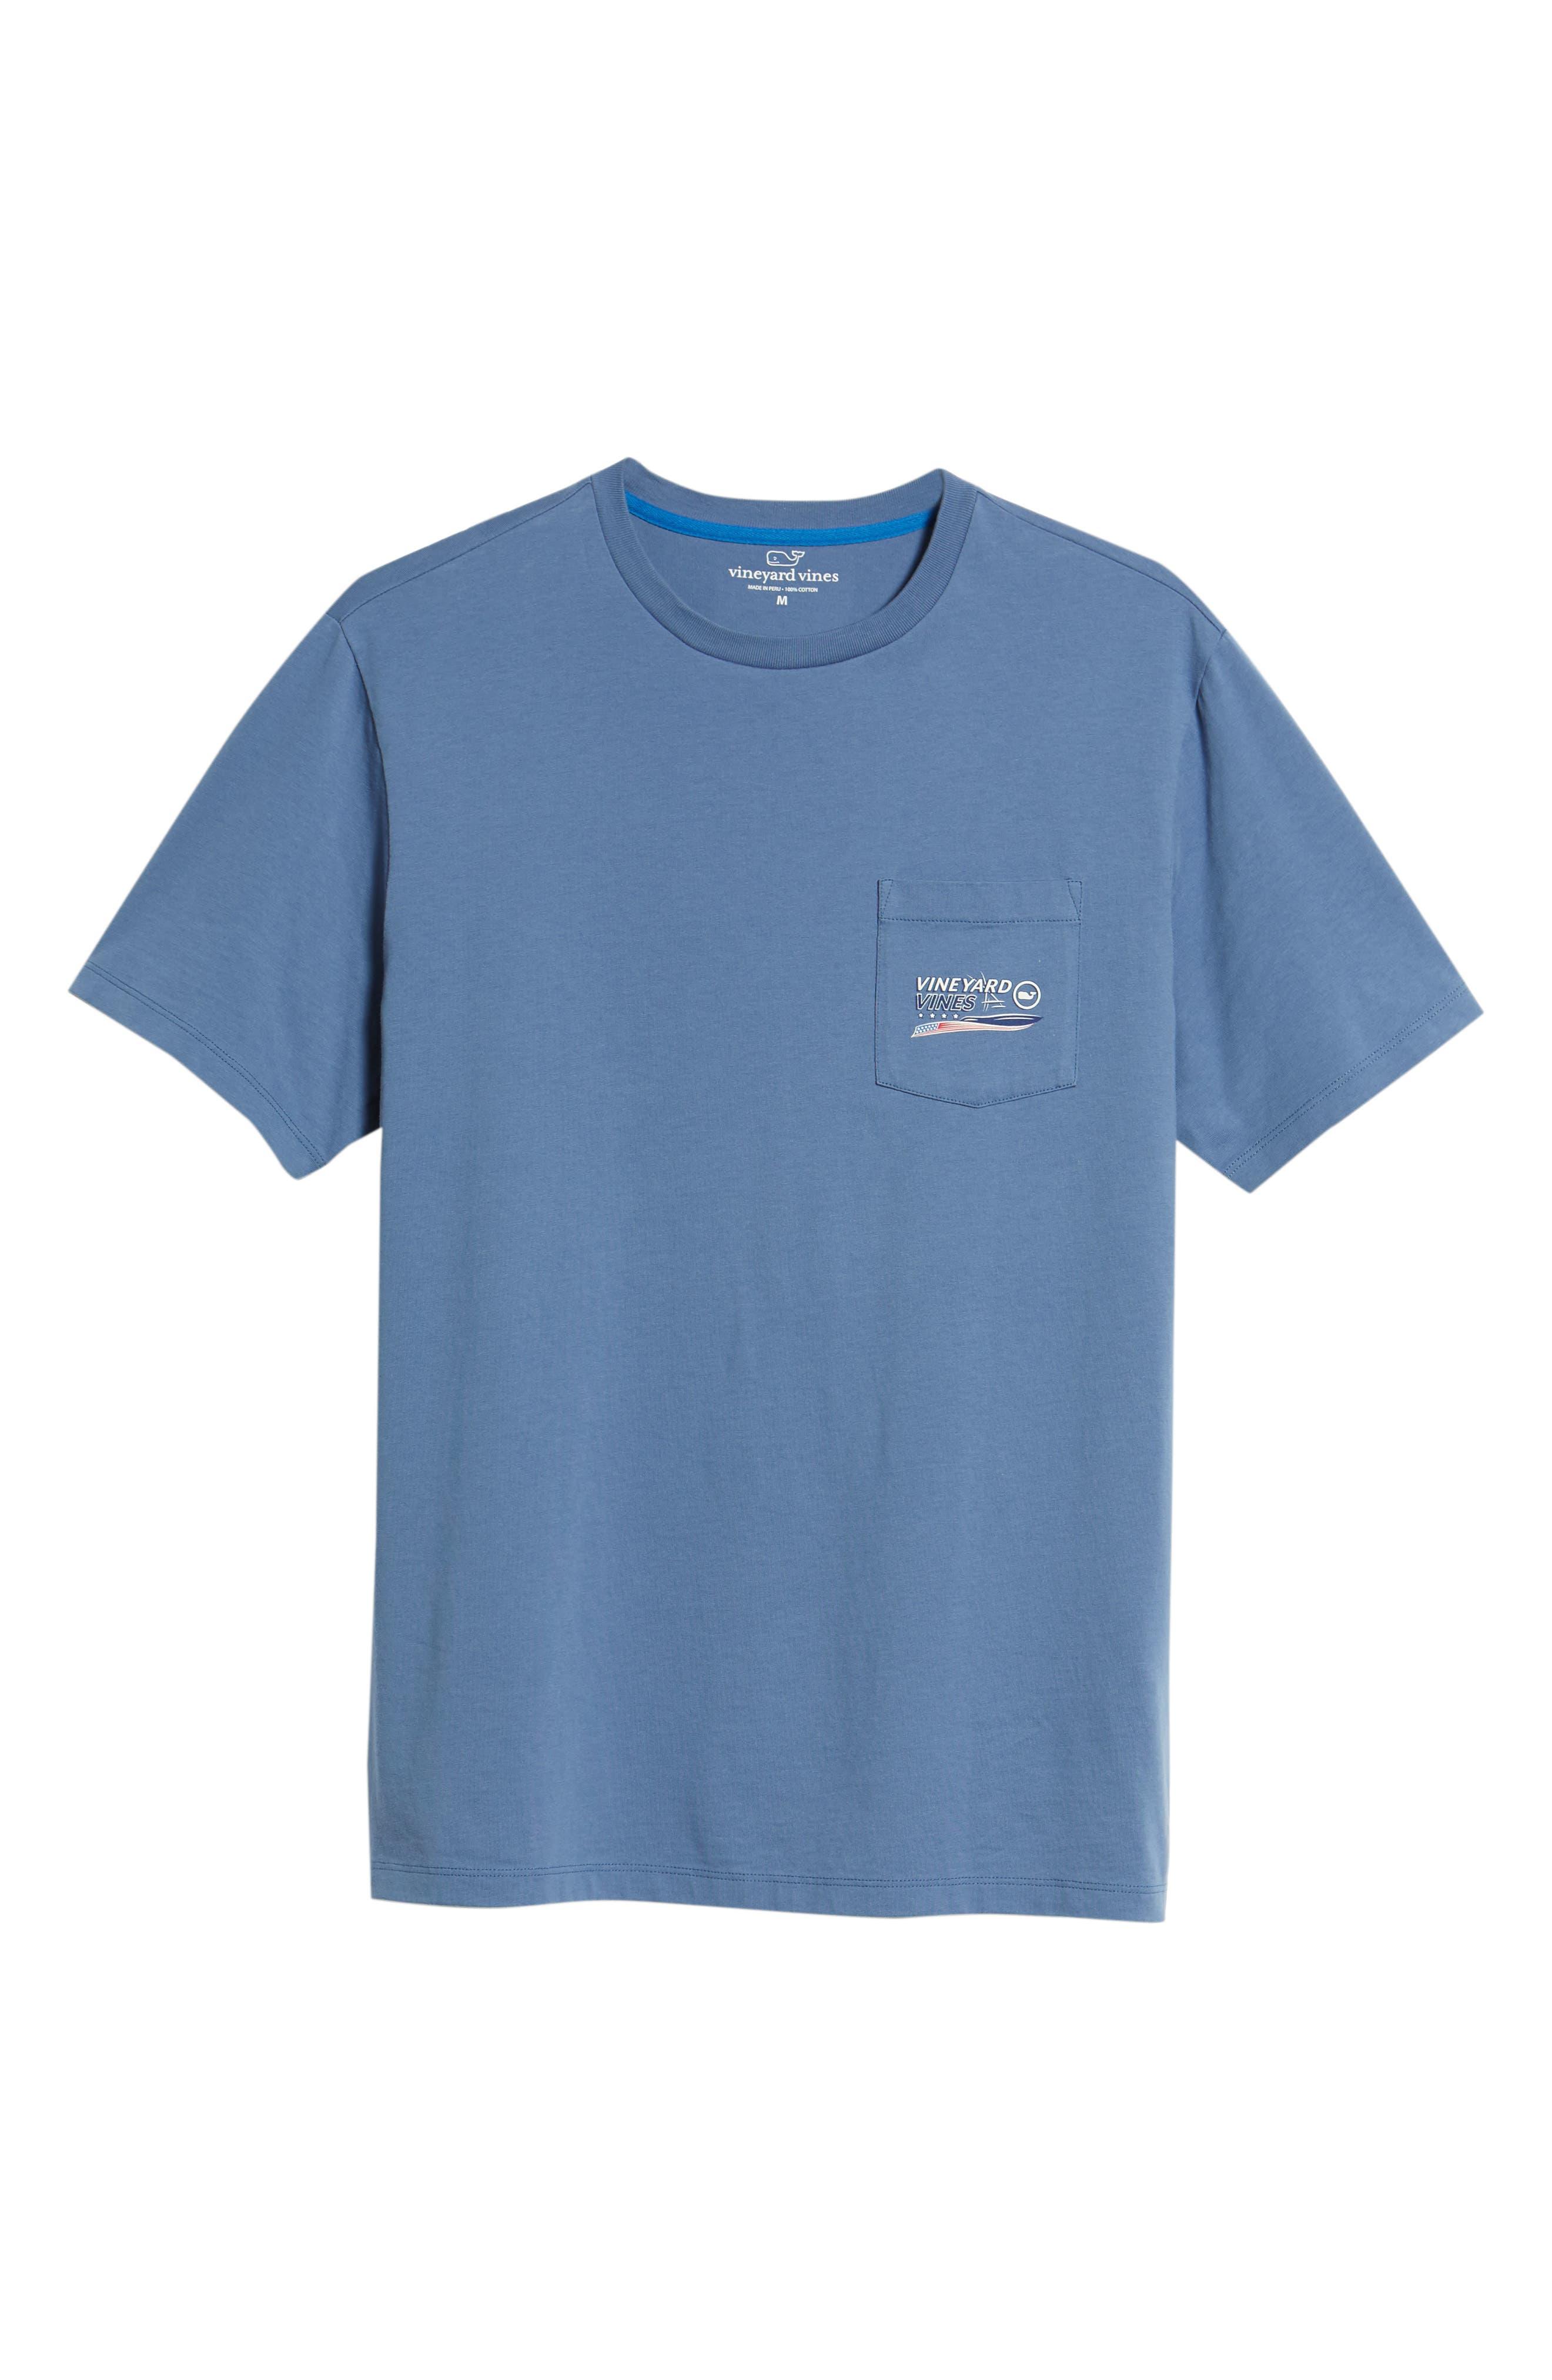 American Sportfisher T-Shirt,                             Alternate thumbnail 6, color,                             Moonshine